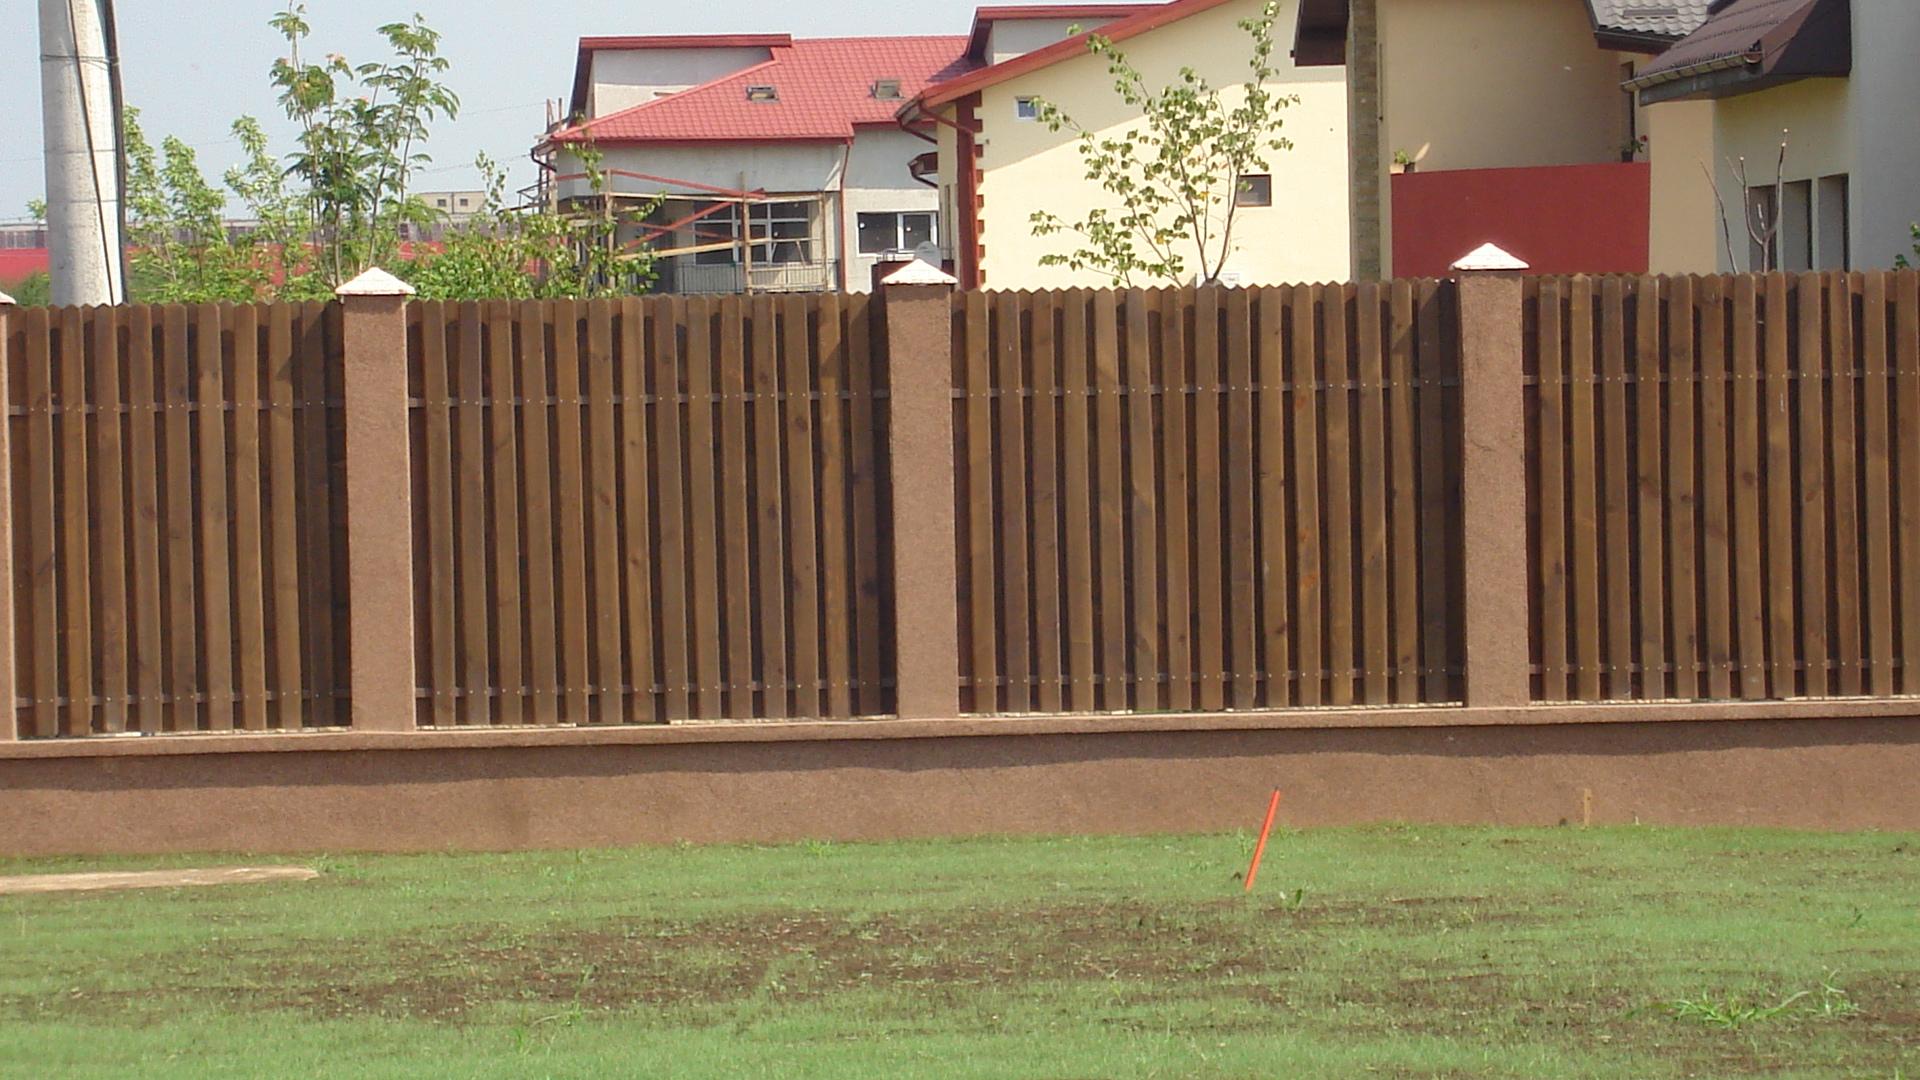 Gard Din Lemn Artwood Xxi S R L